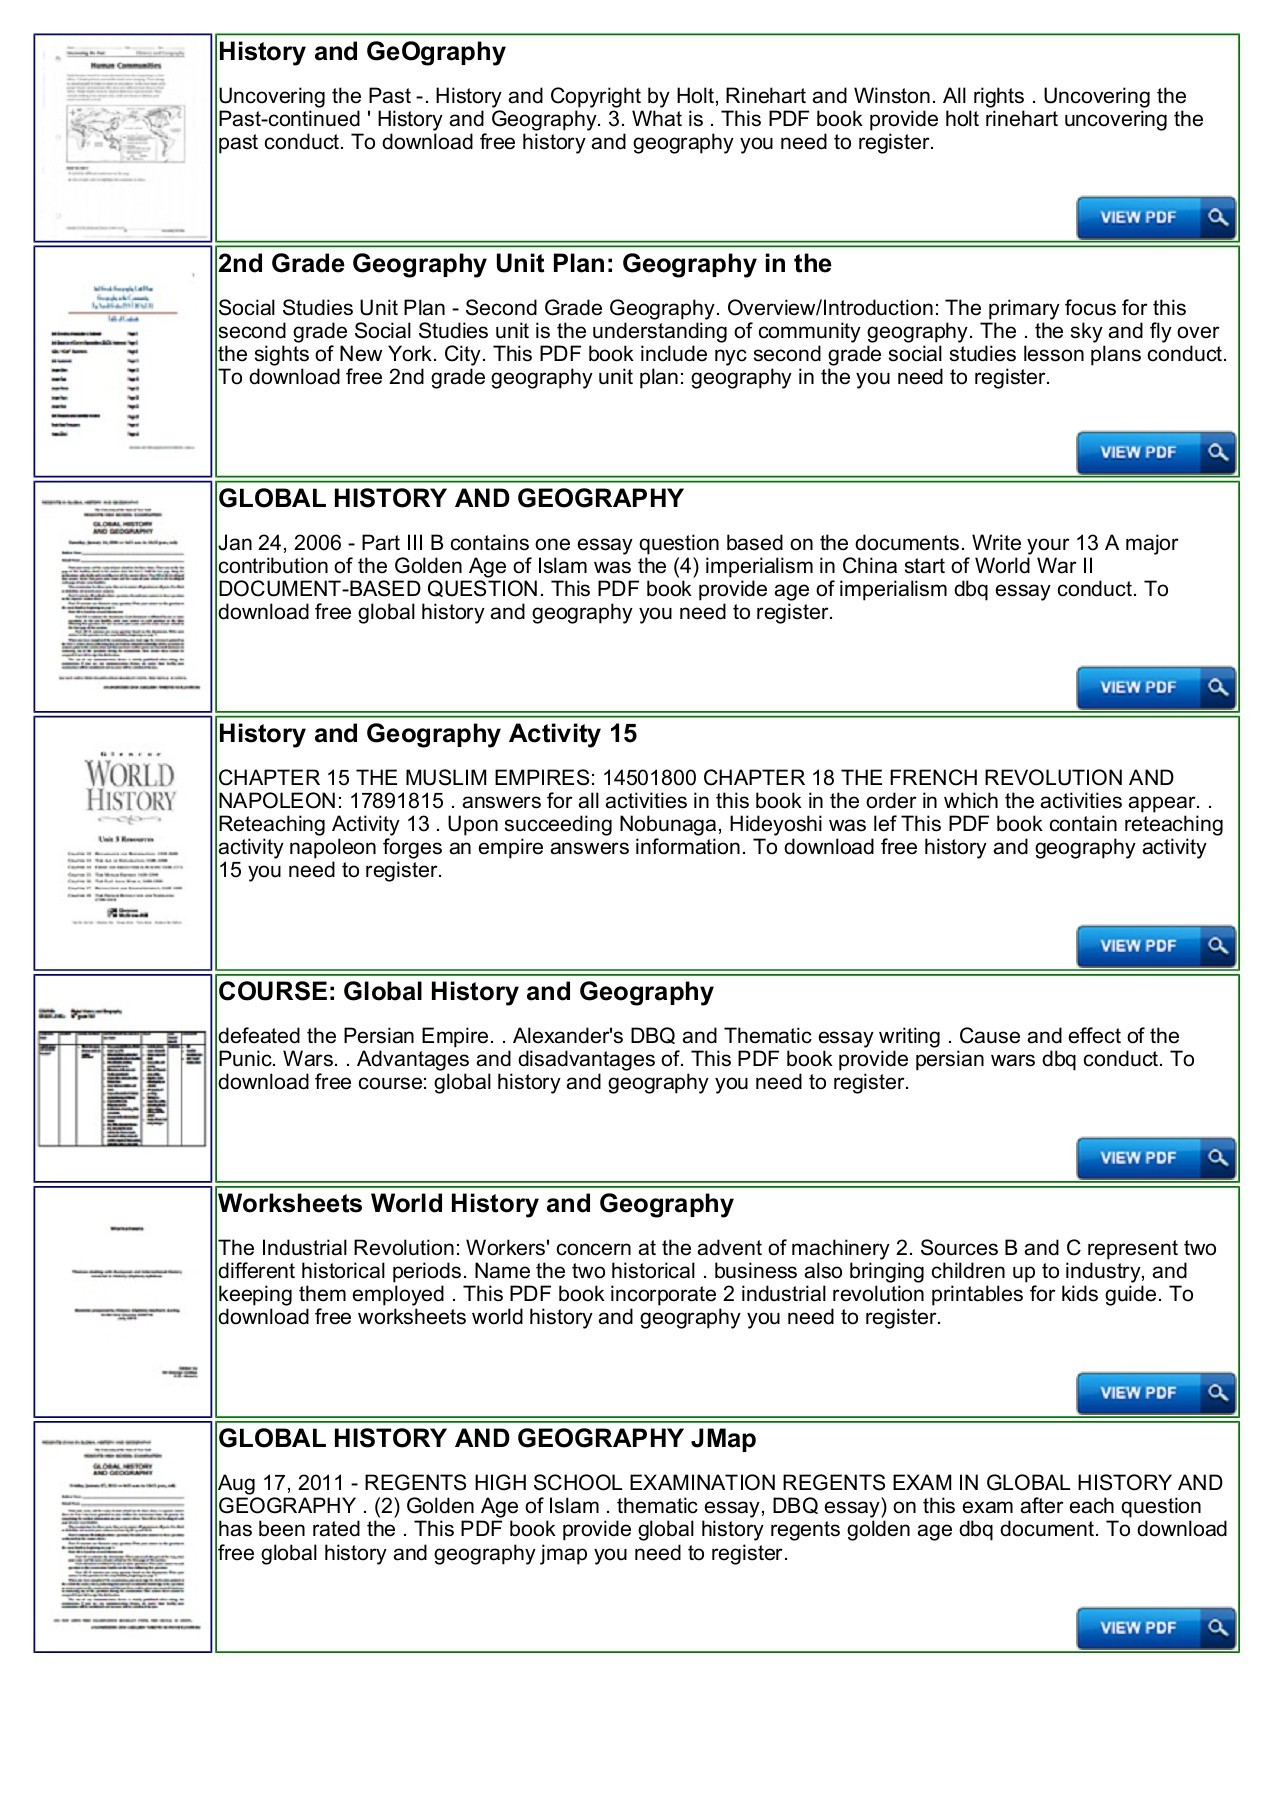 Holt Rinehart And Winston History Worksheet Answers